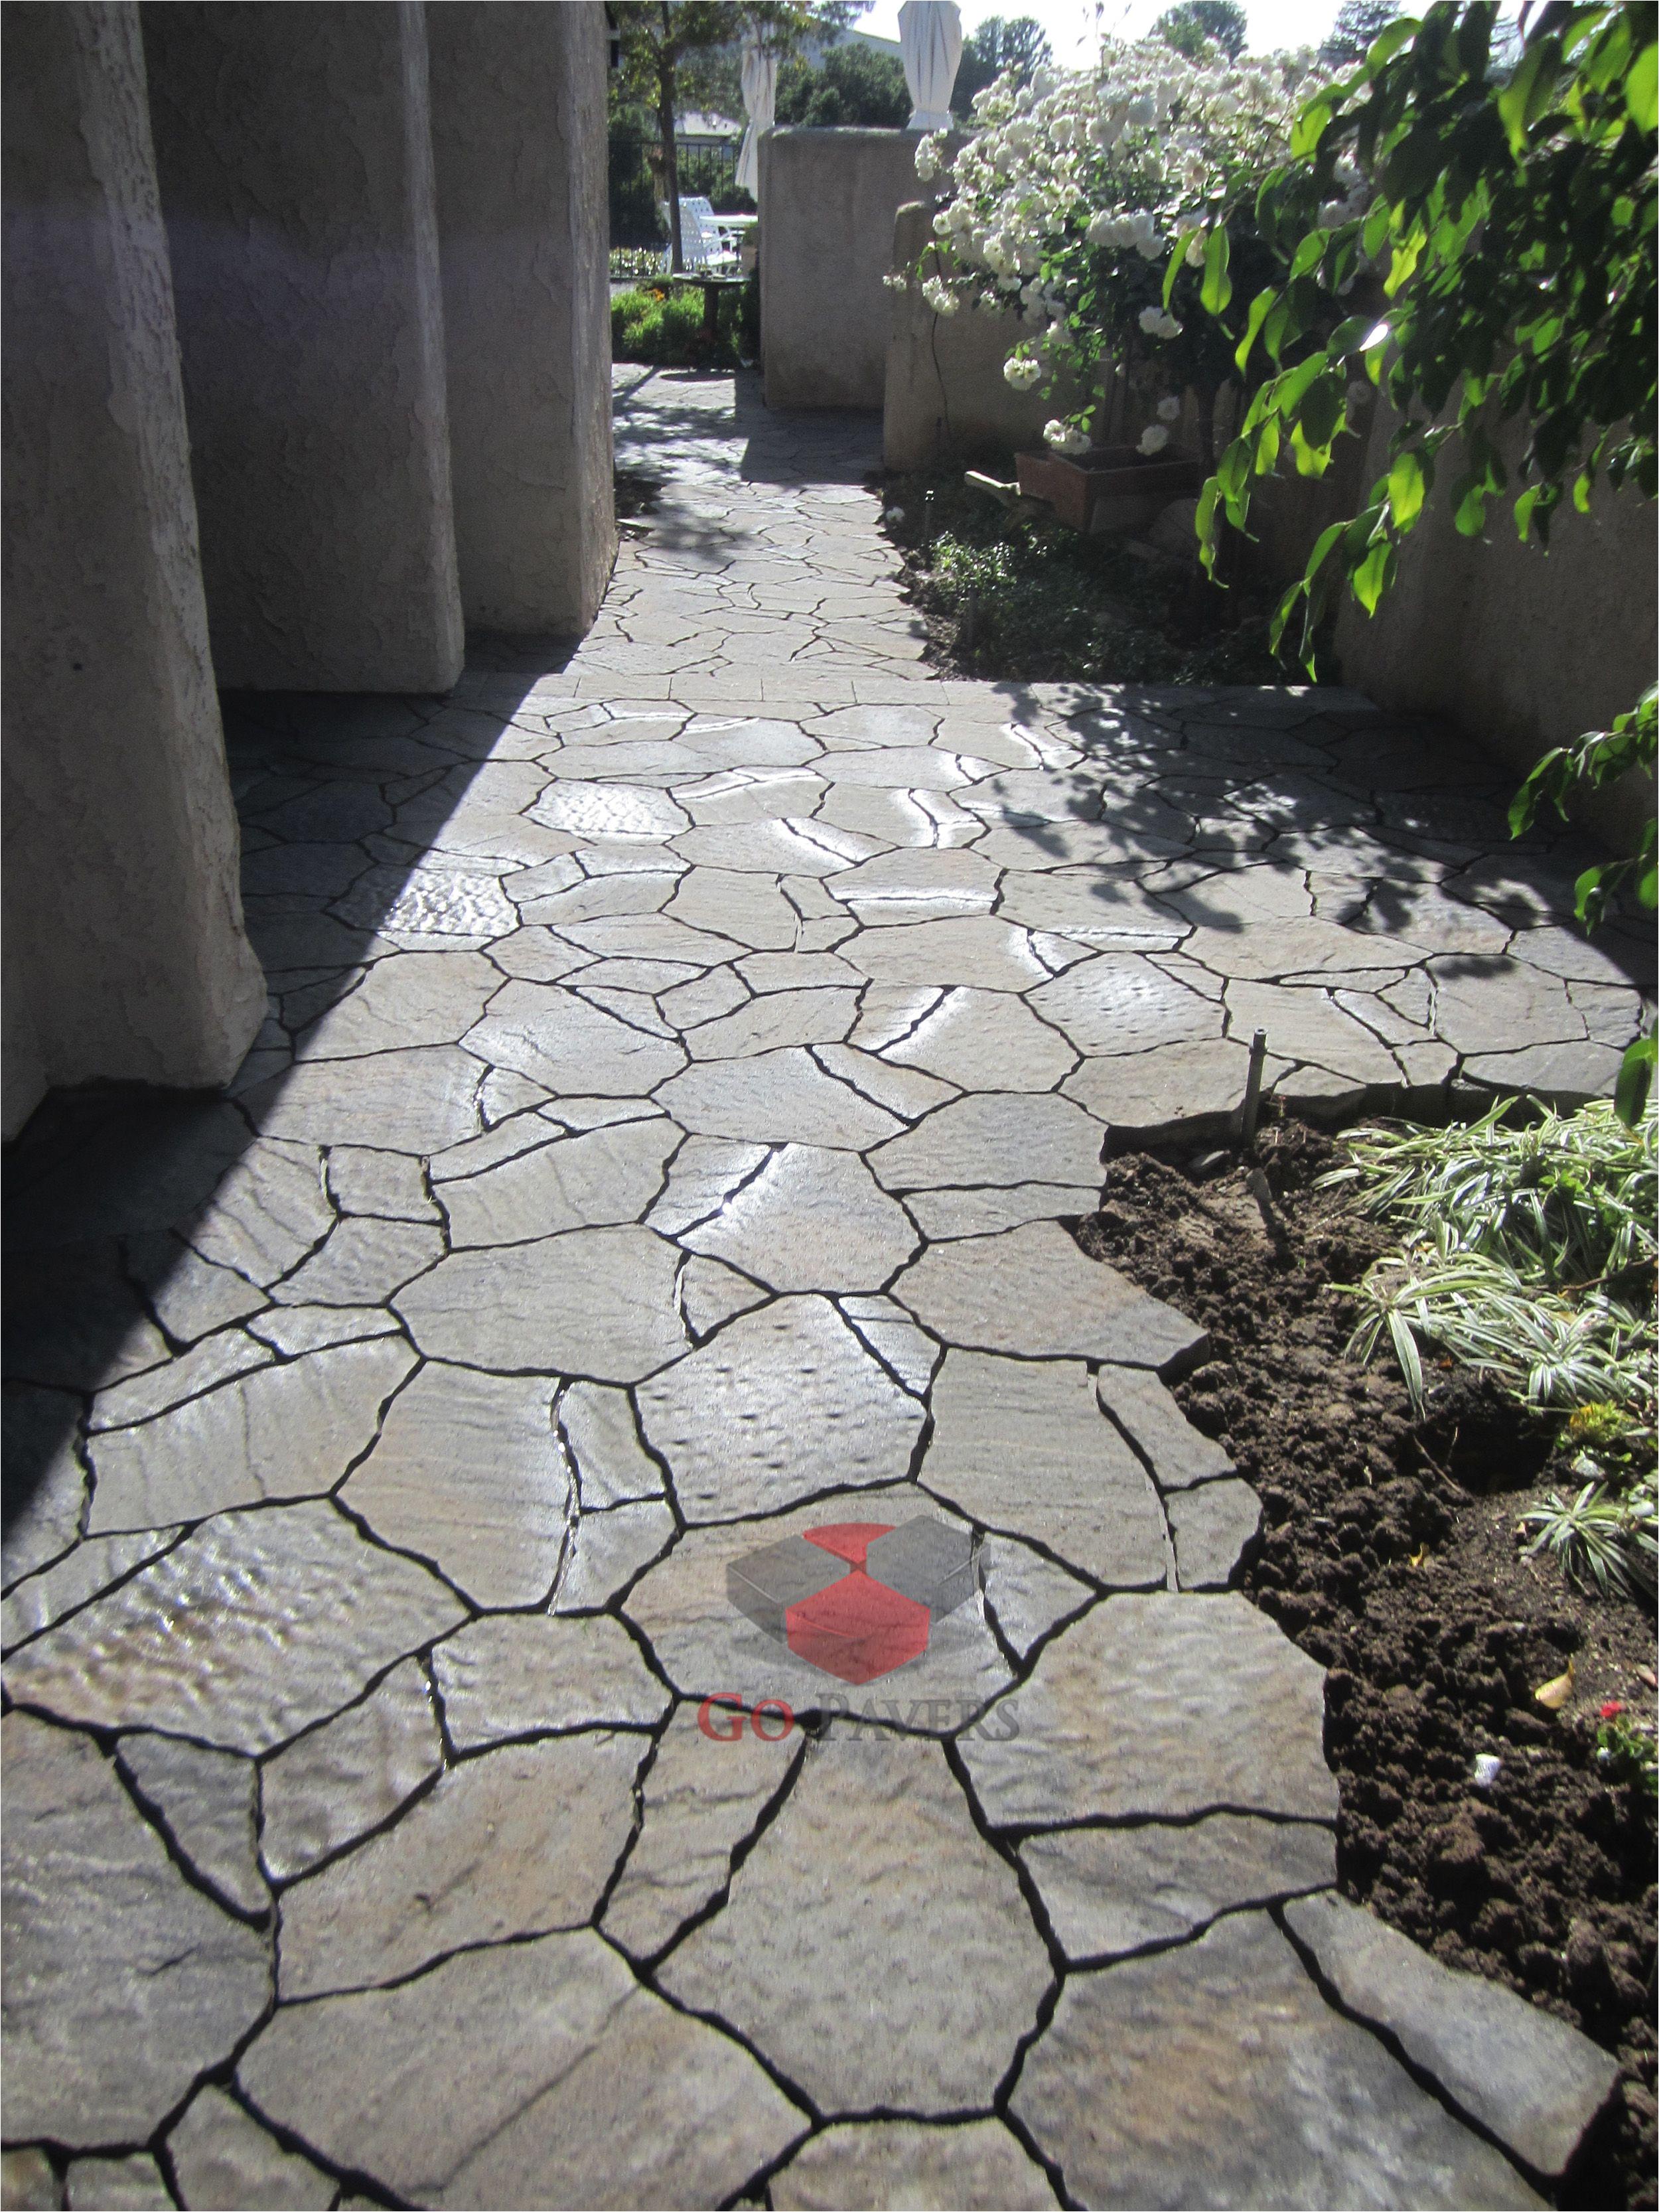 Belgard Pavers Price List 2019 Thousand Oaks Walkway Belgard Mega Arbel Pavers Victorian Color